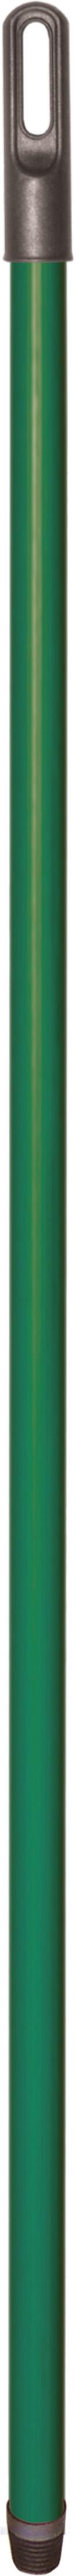 02299 - Besenstiel 130cm, Metall, verstärkt, grün